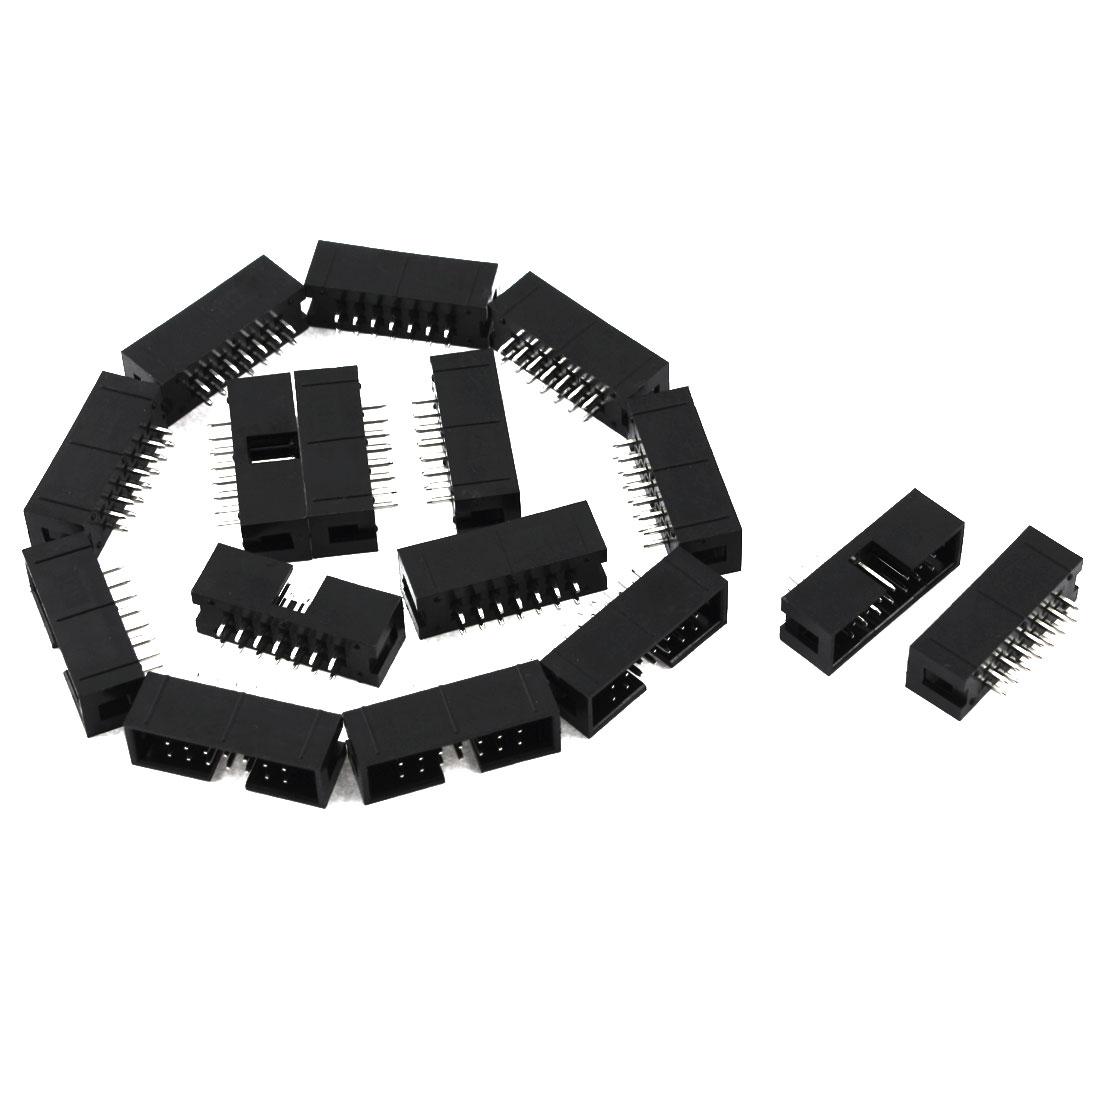 16 Pcs Dual Row Straight 14 Pin 2.54mm Male Header Socket Strip PCB Connector